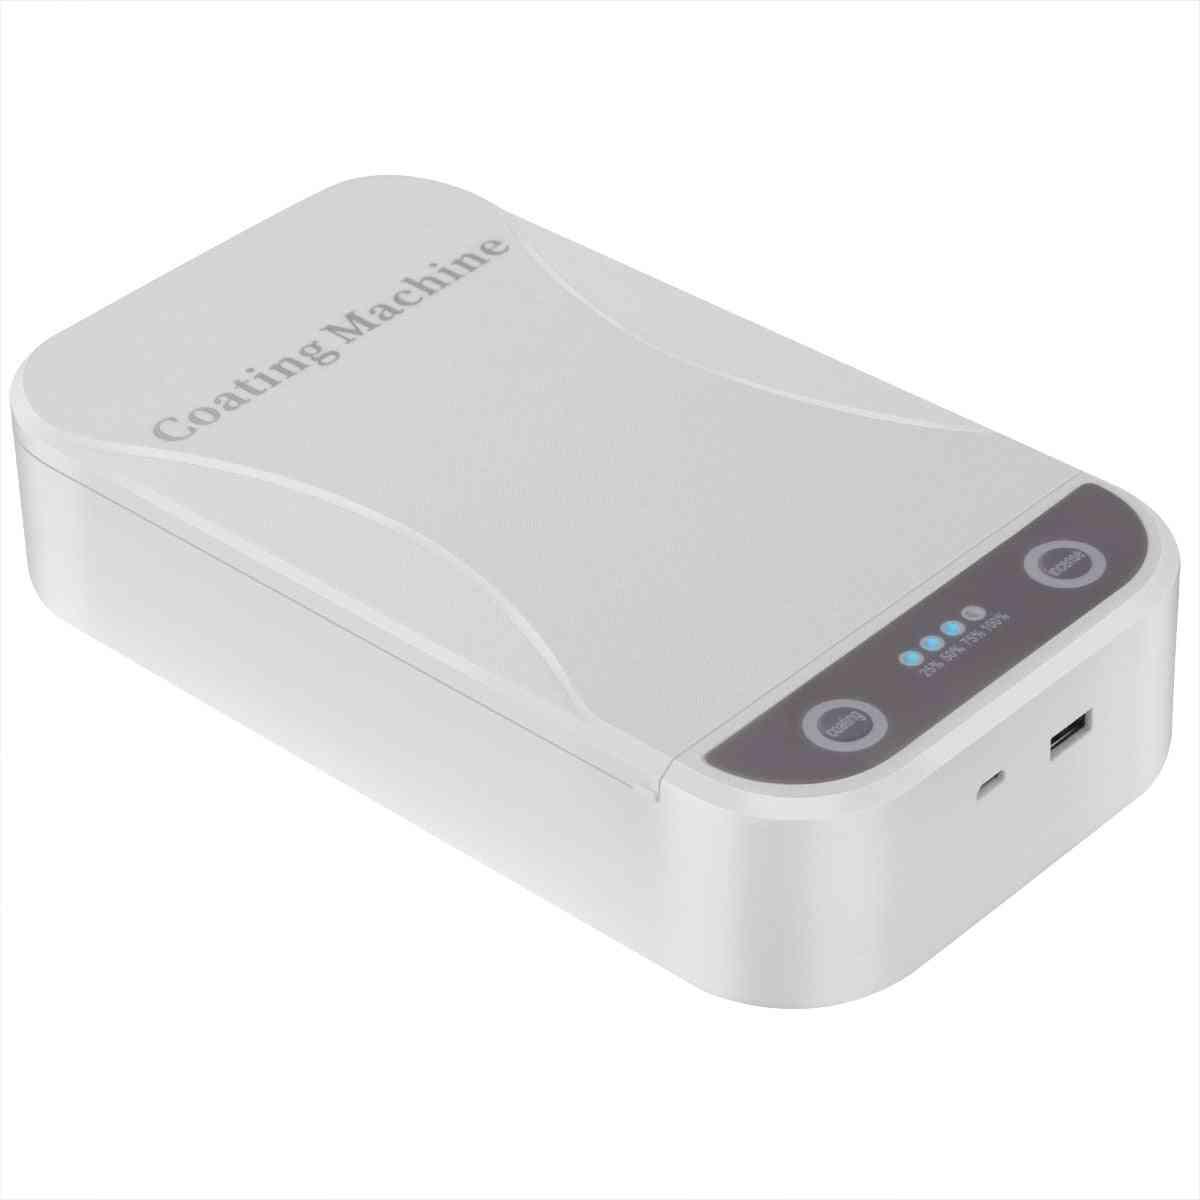 5v Portable Uv Sterilizer, Toothbrush Mask Uv Disinfection Box- Usb Charging Dual Uv Germicidal Lights For Makeup Brushes